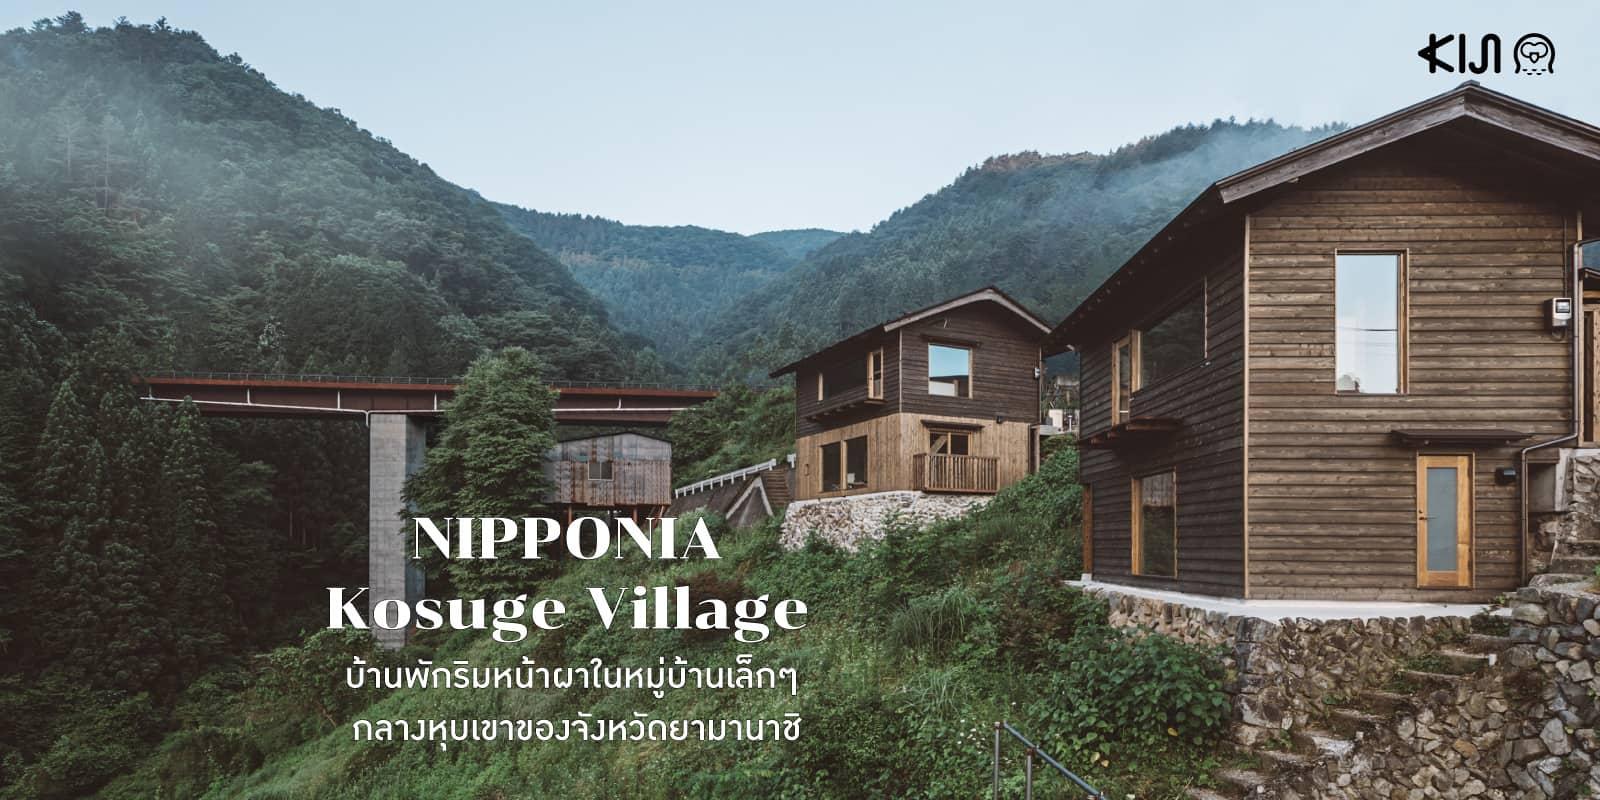 NIPPONIA Kosuge Village ยามานาชิ โฮมสเตย์ญี่ปุ่น